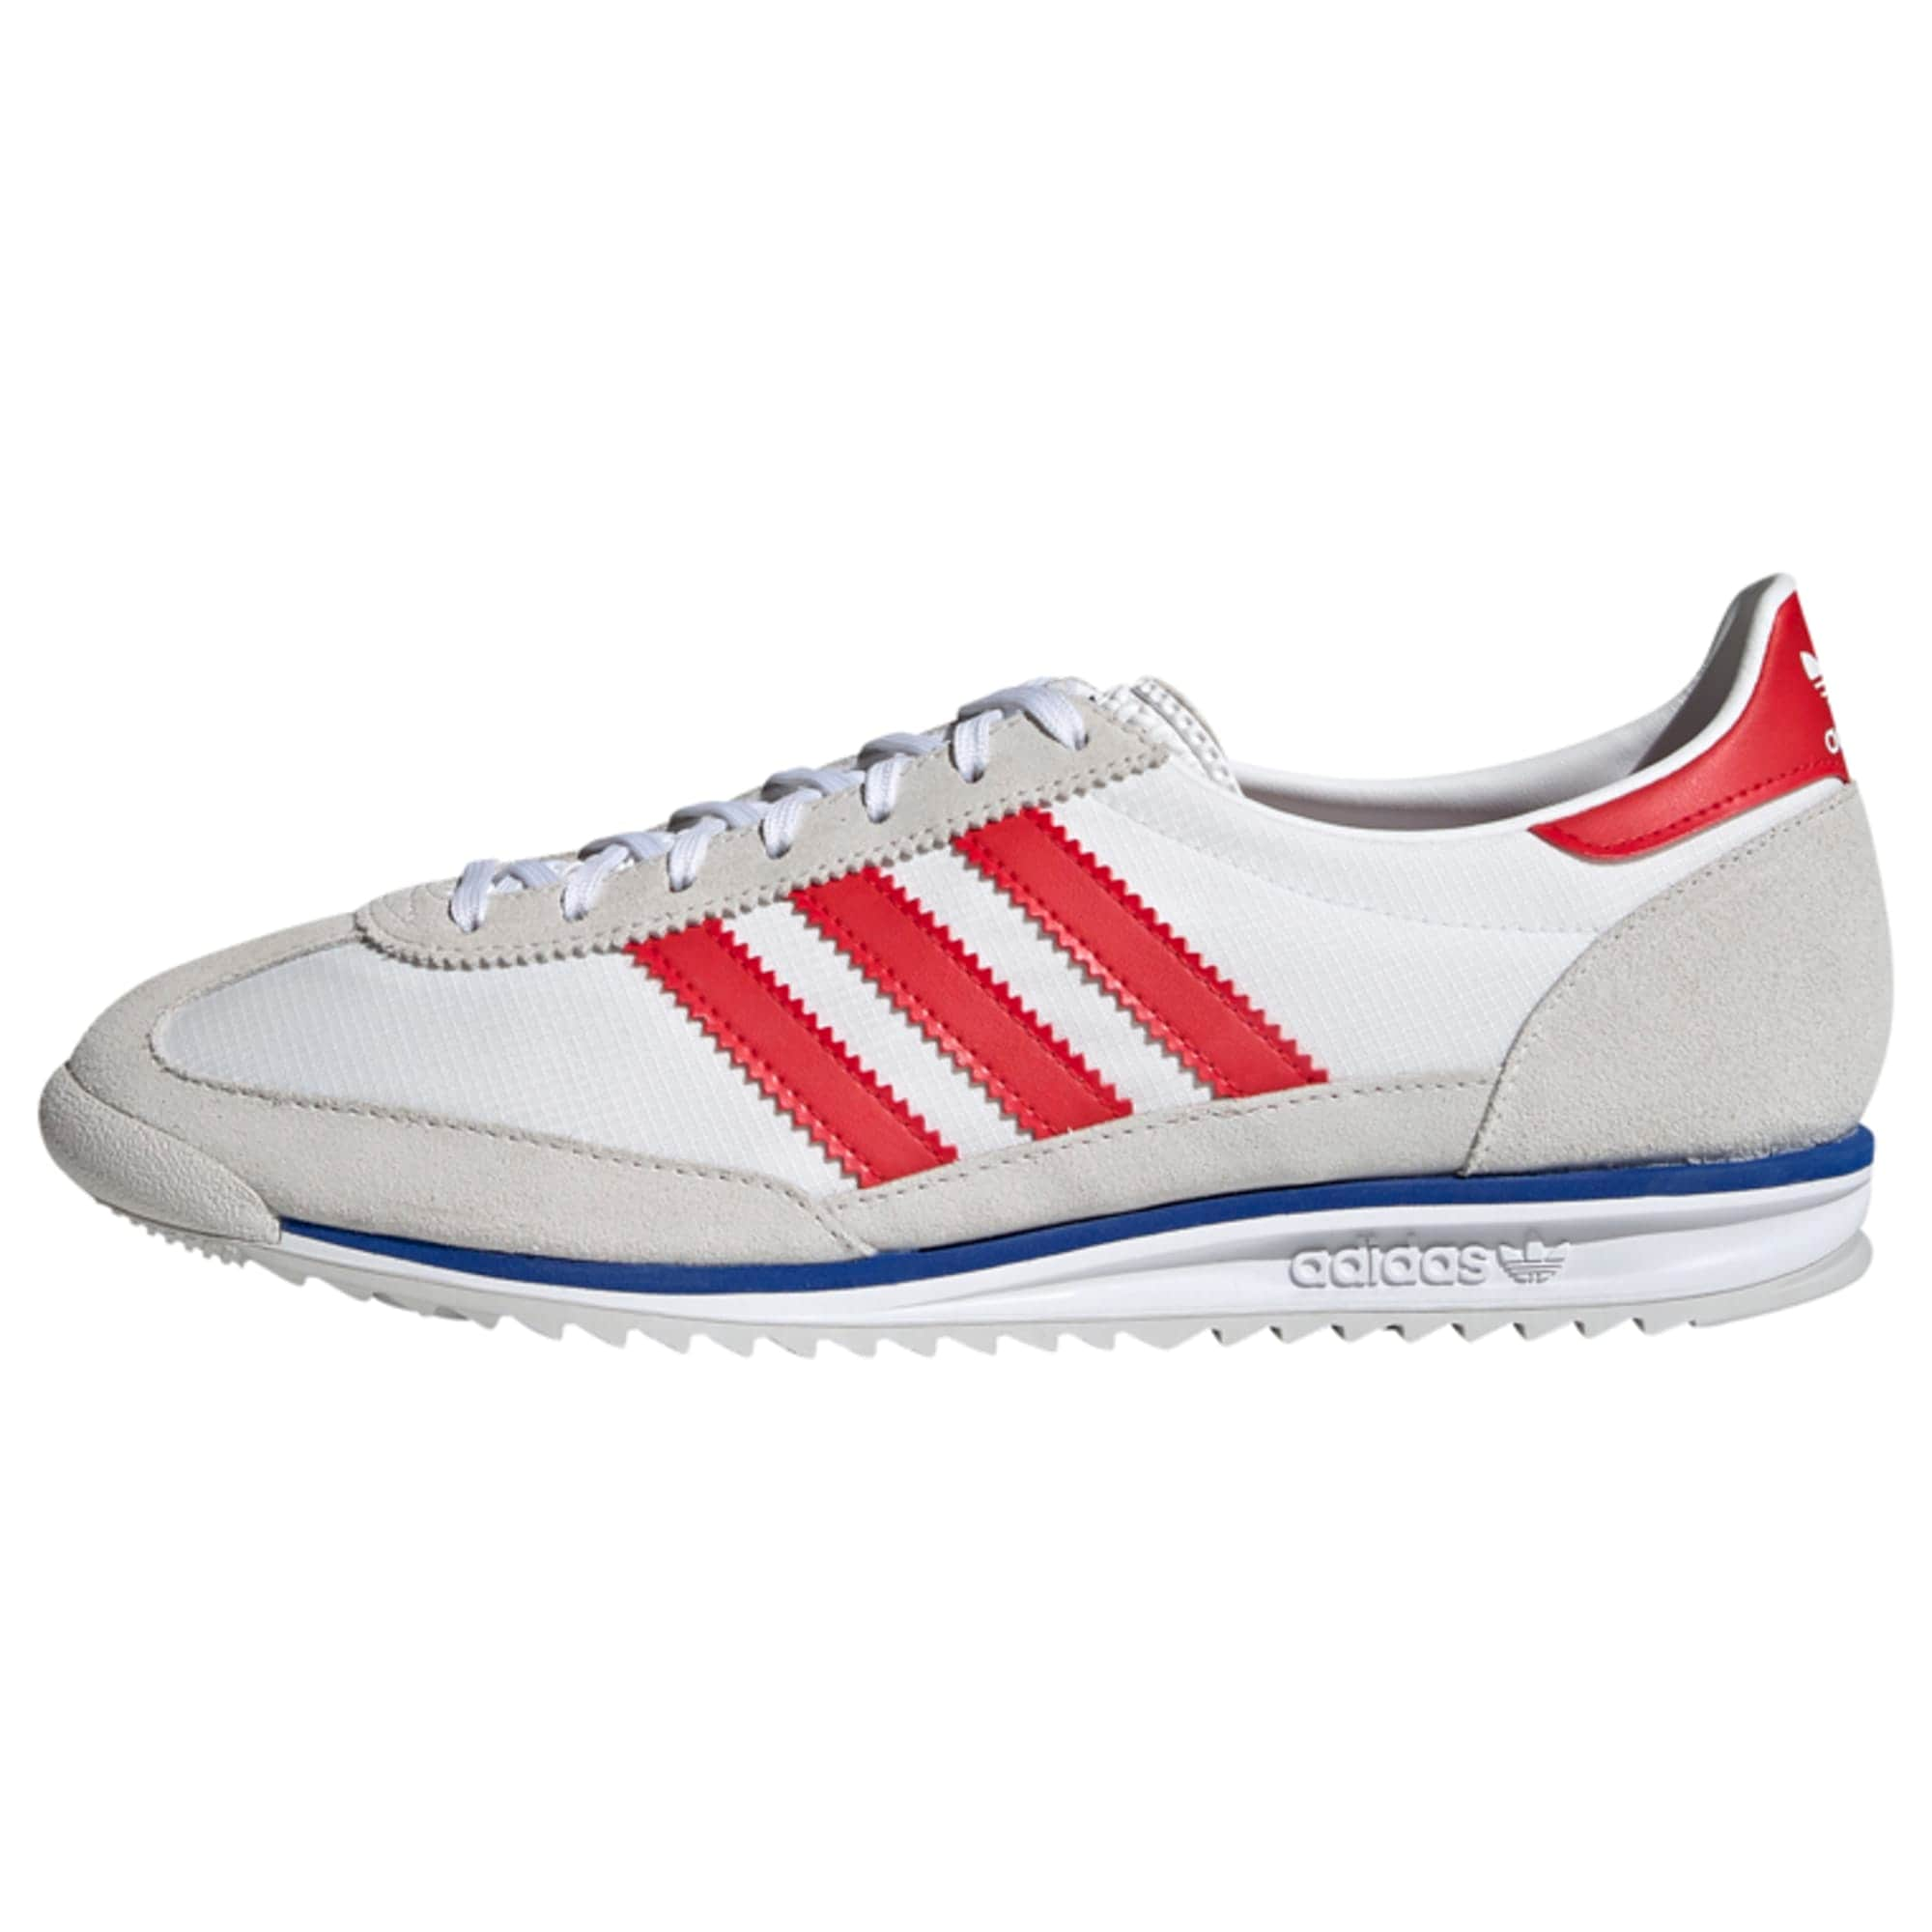 ADIDAS ORIGINALS Tenisky 'Sl 72'  šedá / bílá / červená